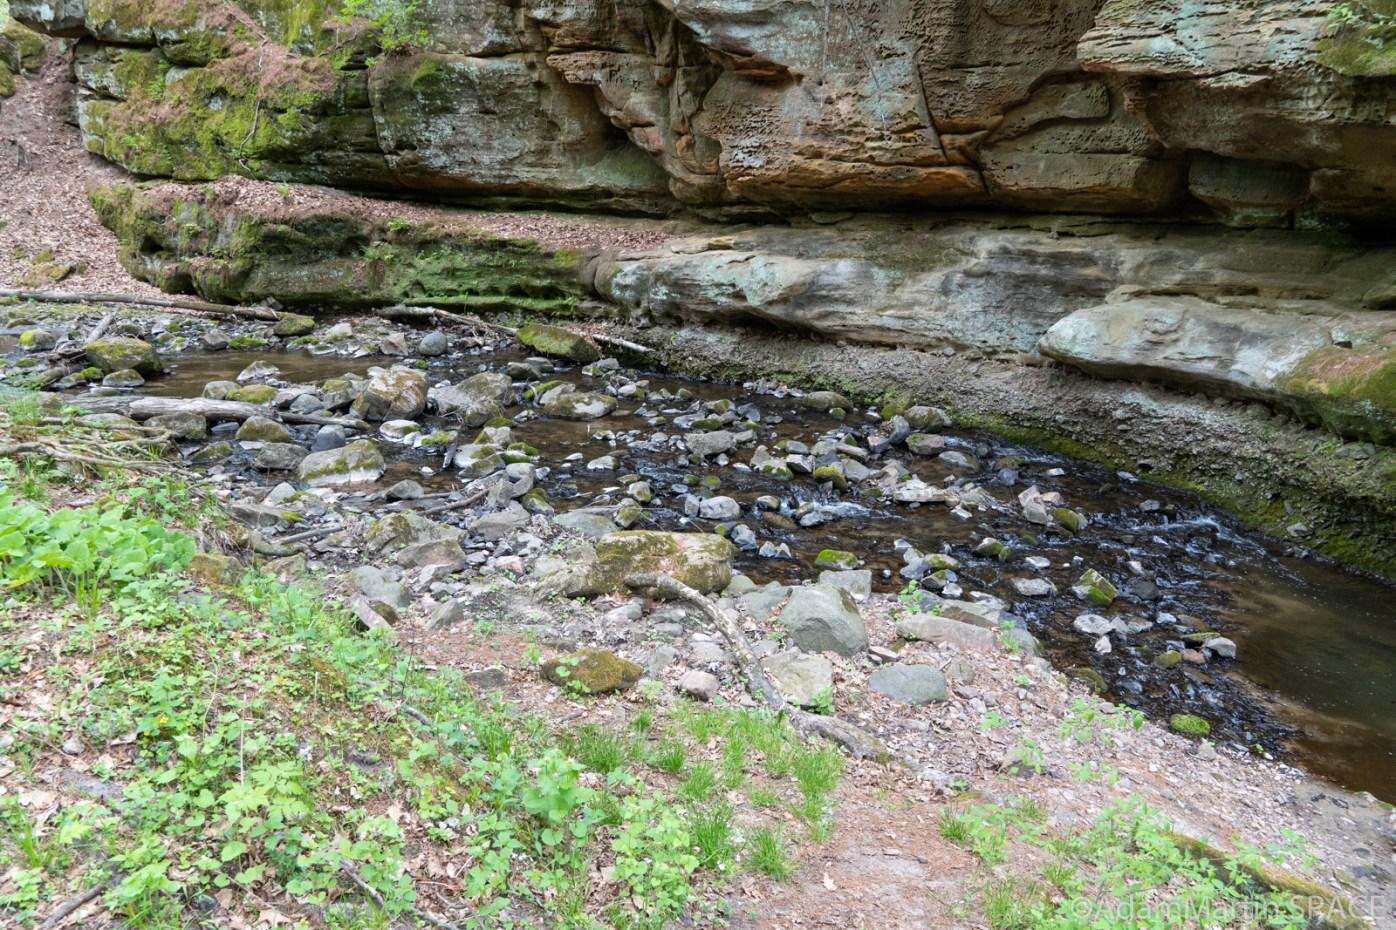 Durward's Glen - Small rocky rapids in the glen